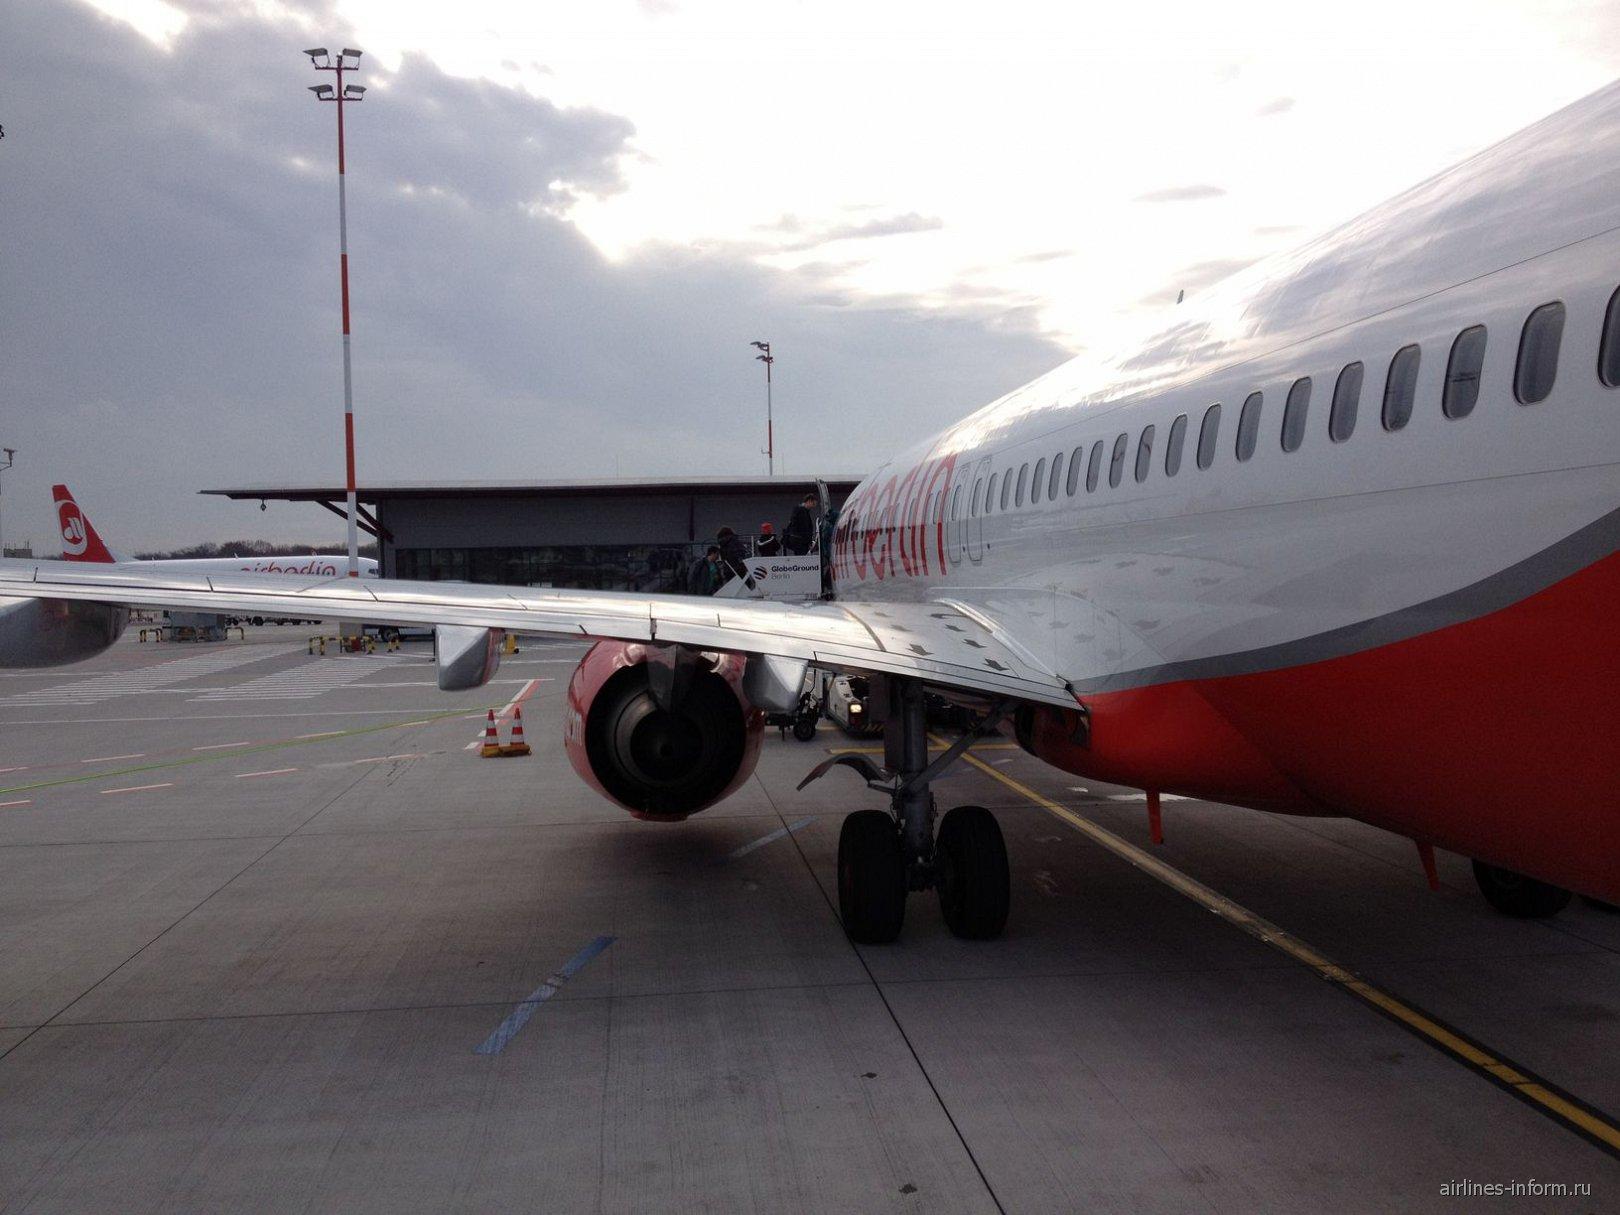 Берлин - Москва, Air Berlin. Зимнее путешествие.